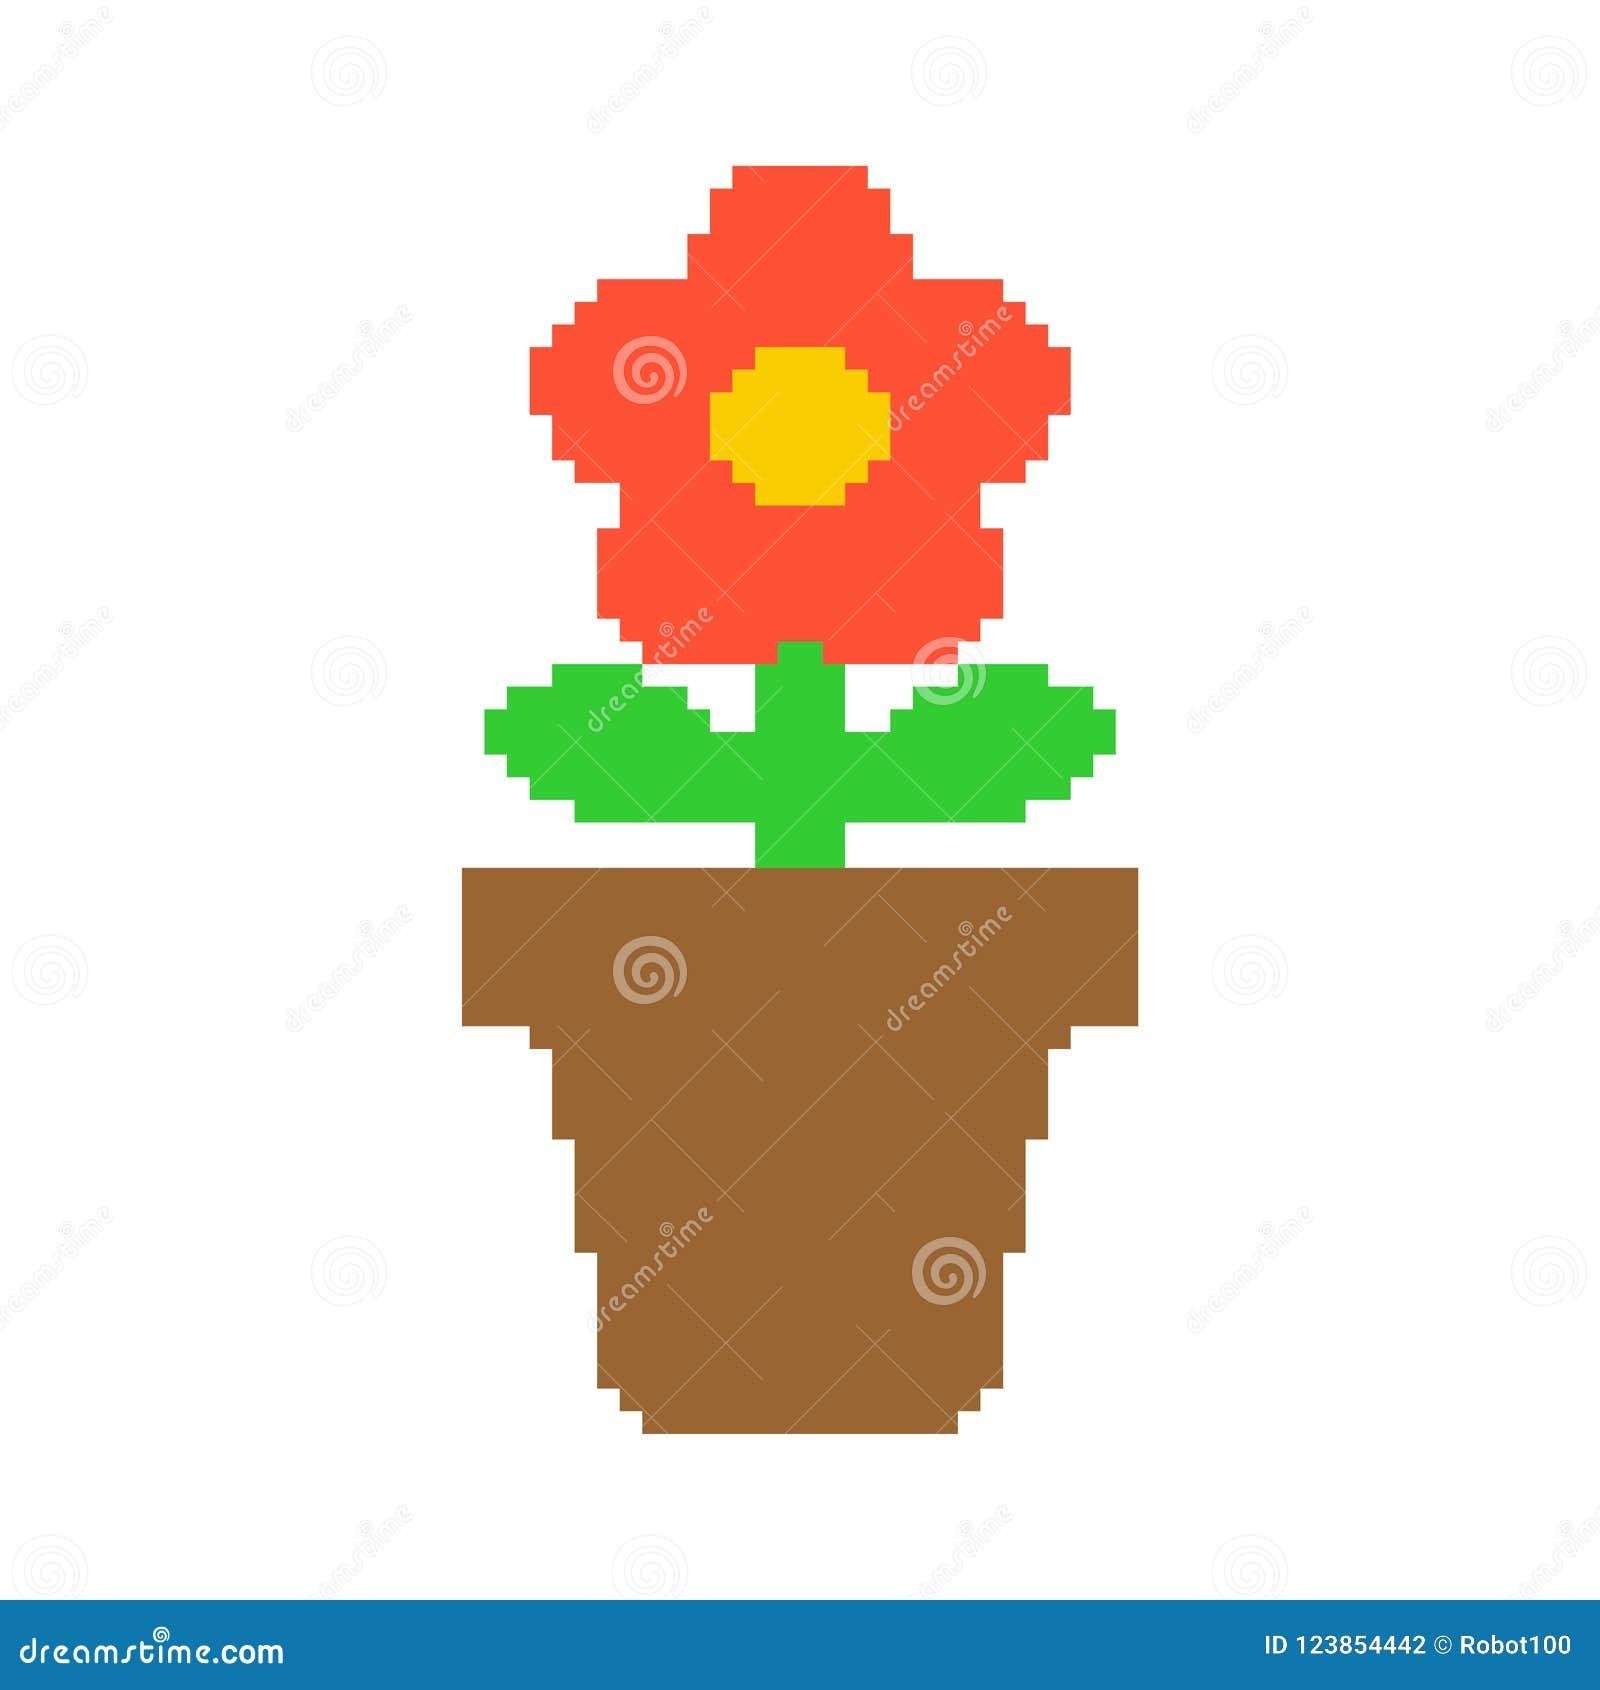 Flower In Pot Pixel Art 8 Bit Vector Illustration Stock Vector